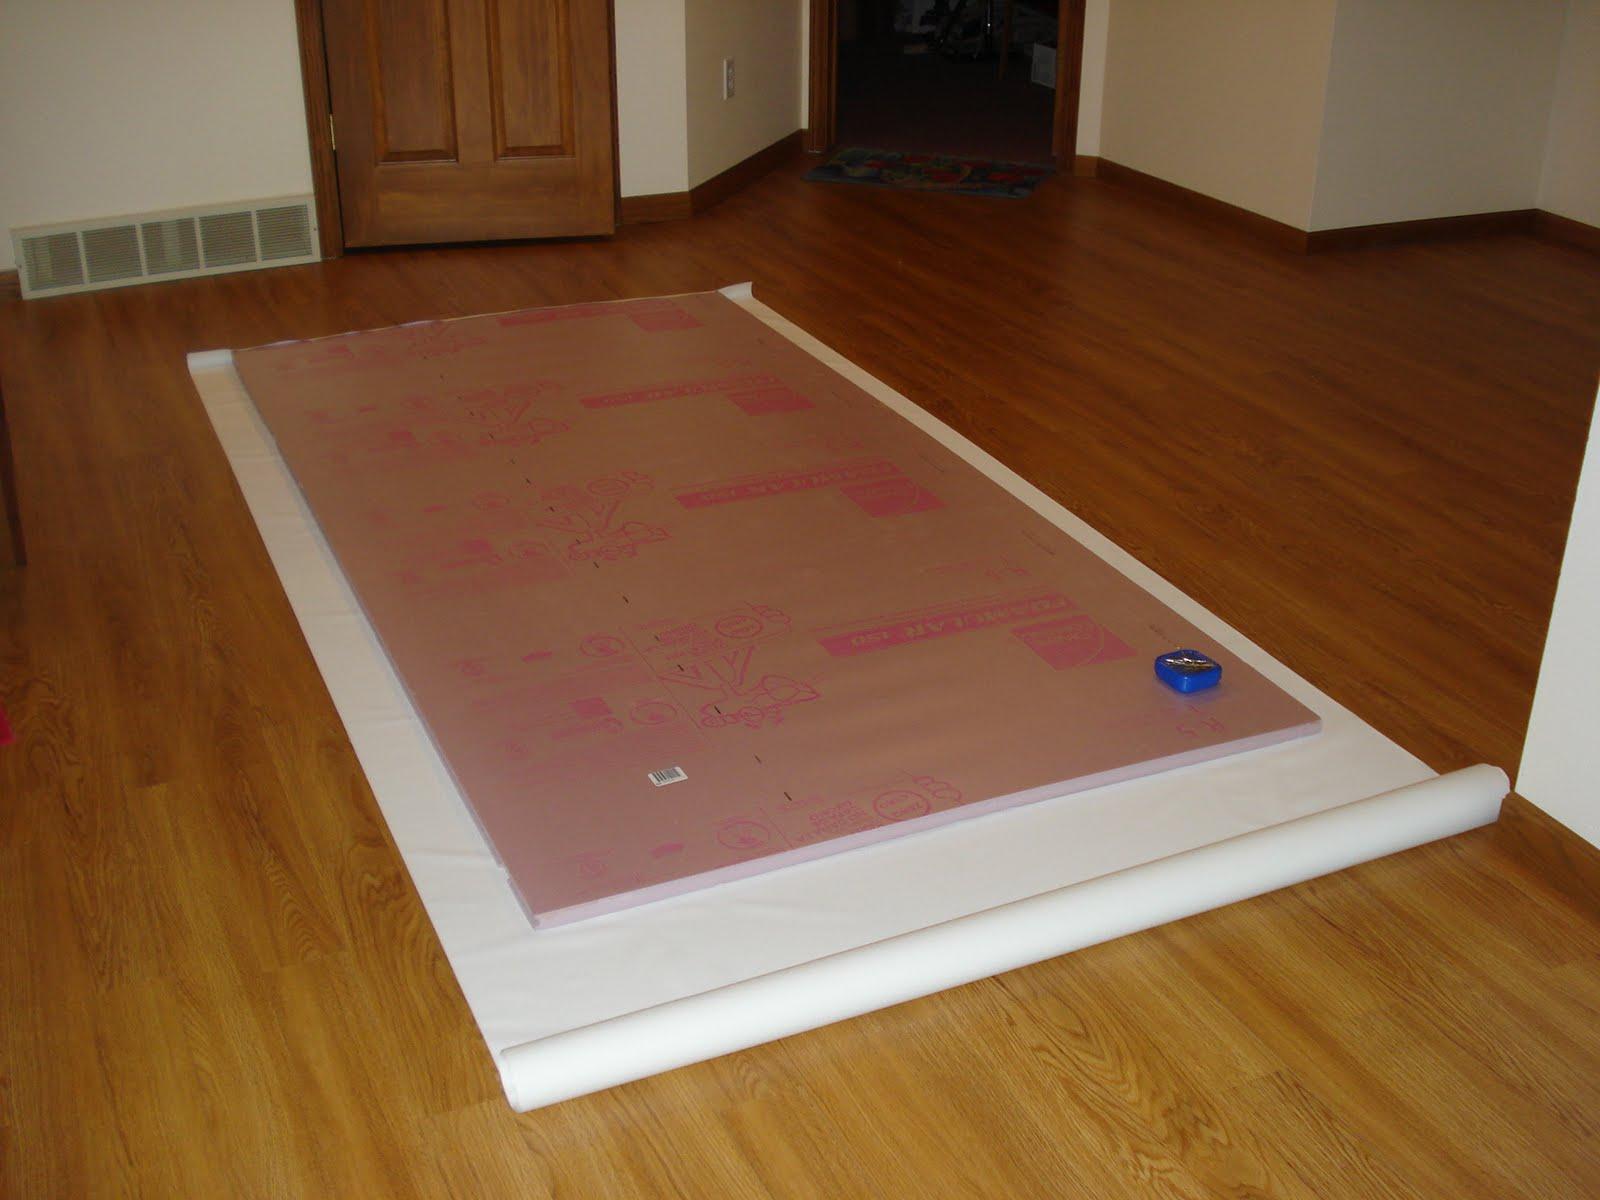 http://4.bp.blogspot.com/_ANthLNRin4U/S_kF2HMs_gI/AAAAAAAAADM/c7qbygCtEWk/s1600/Styrofoam+Panel+Getting+Wrapped.JPG